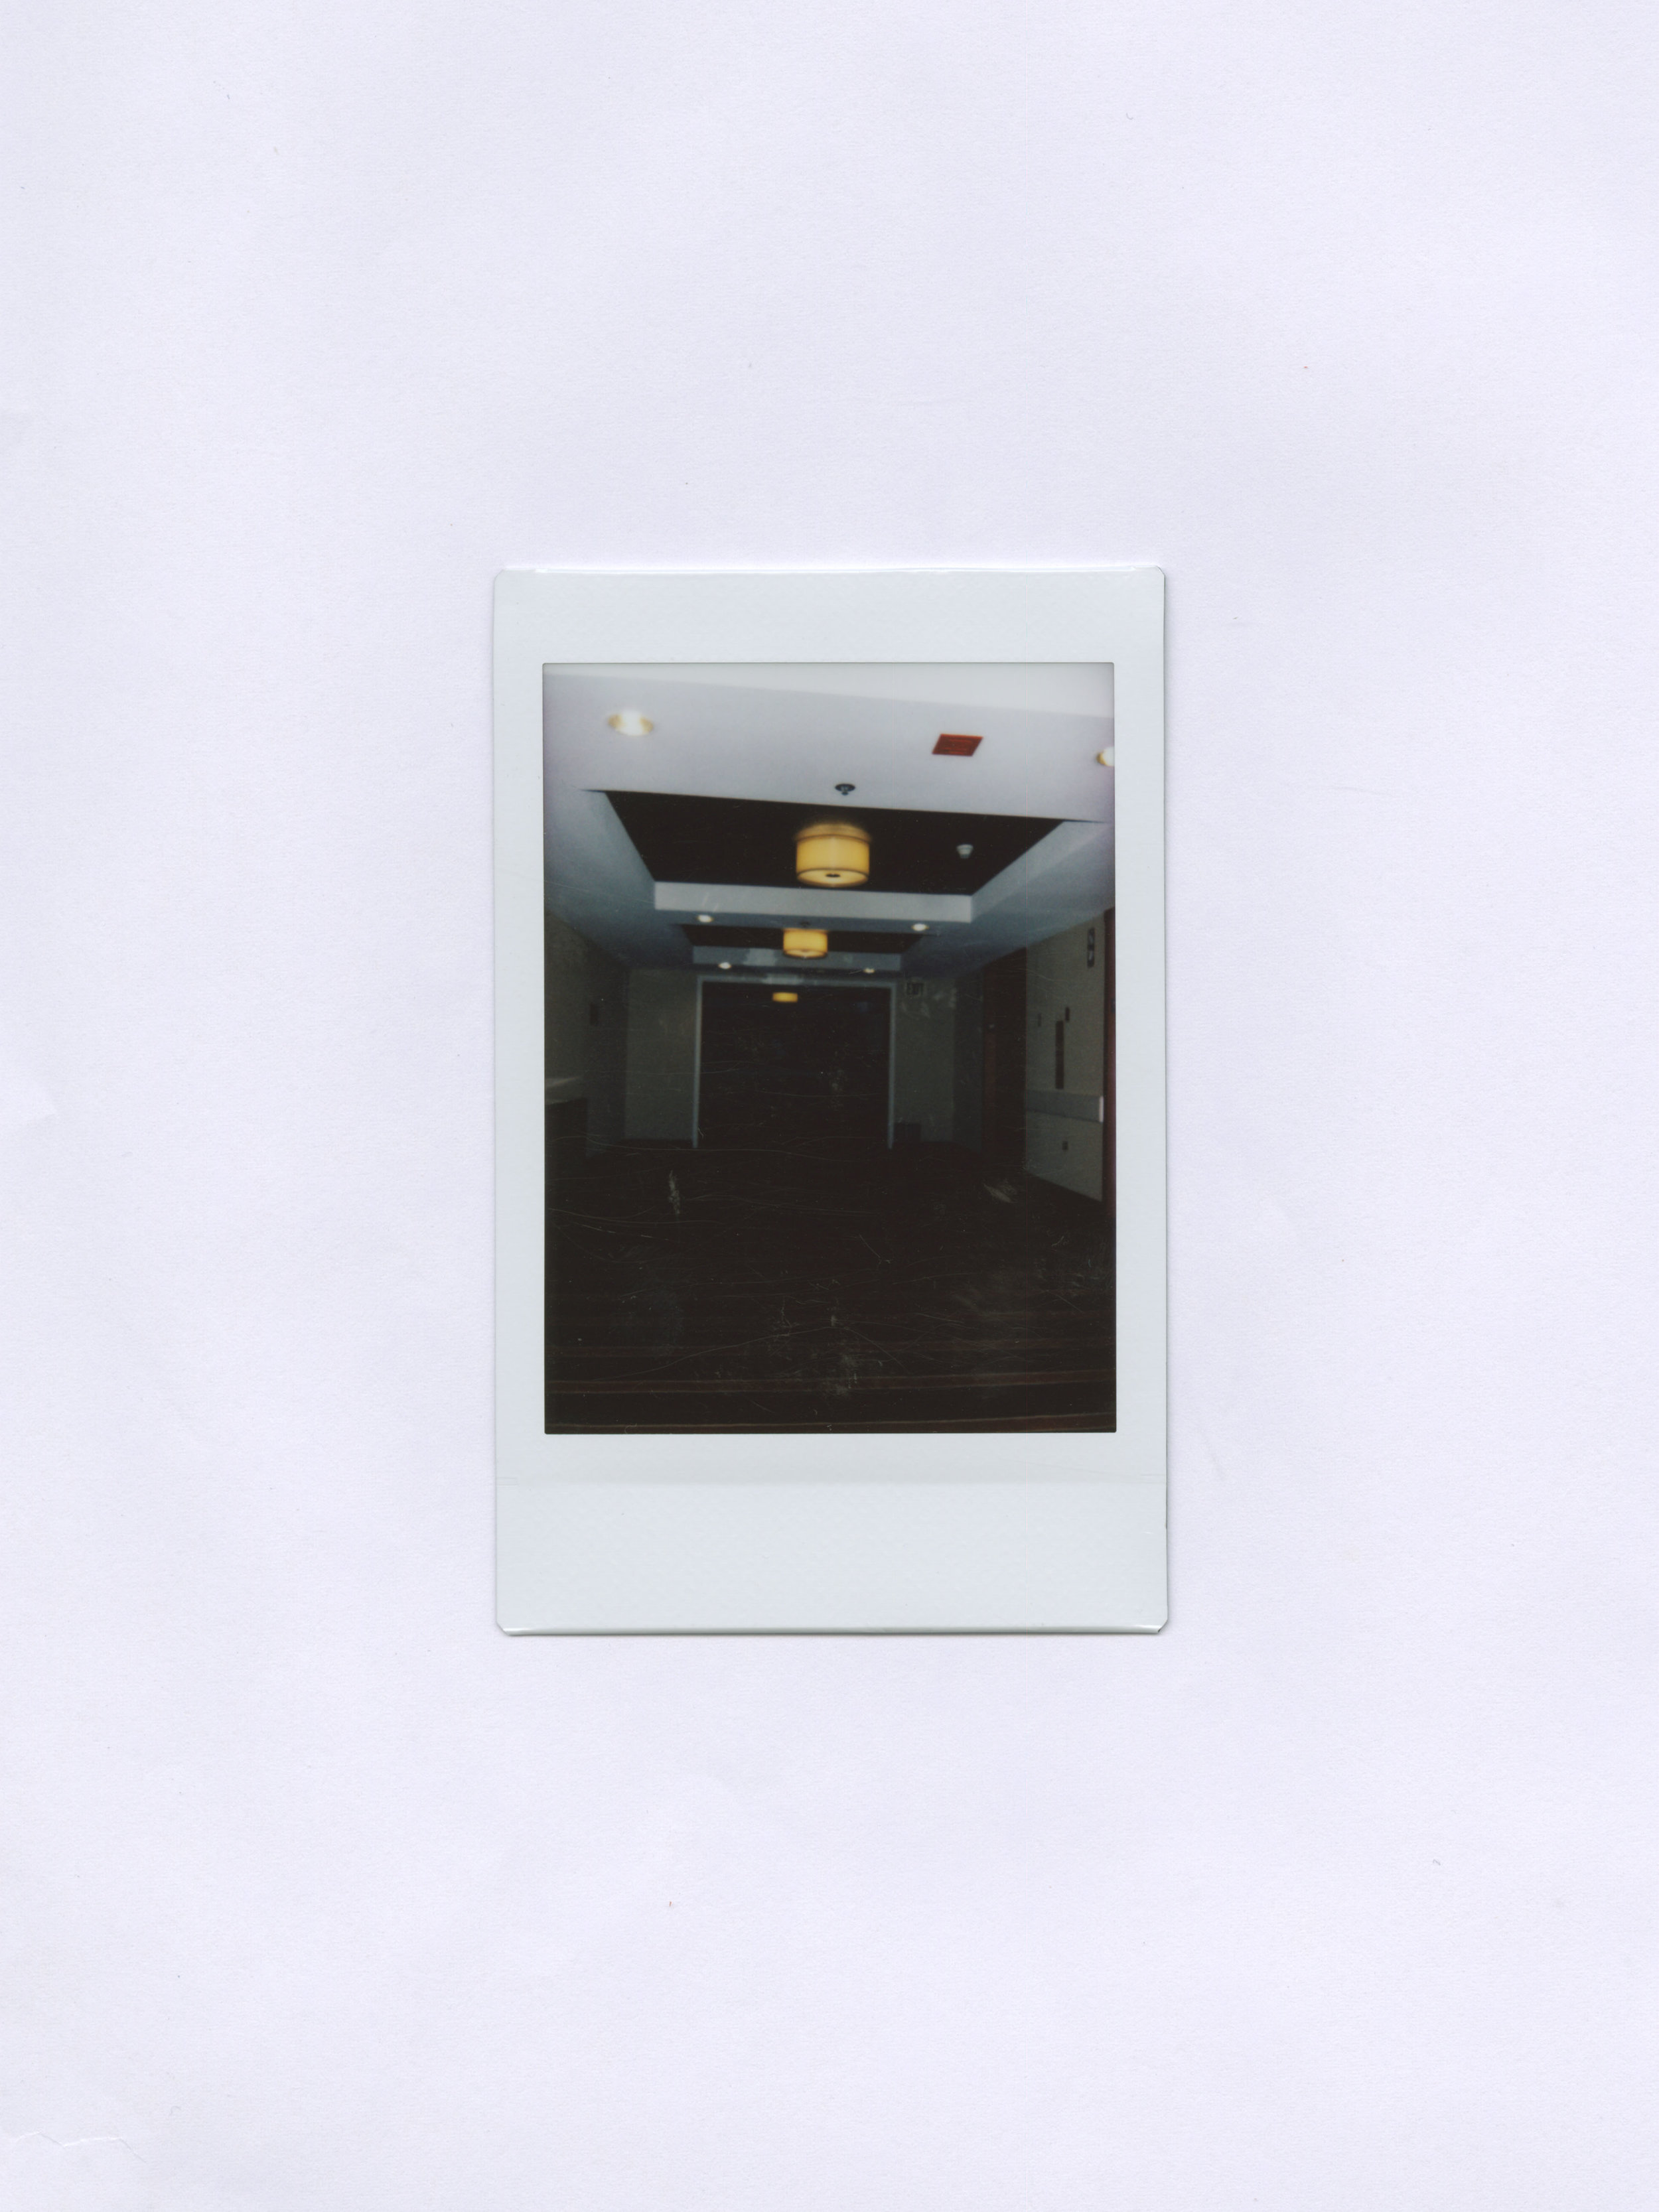 8.fdc208.jpg